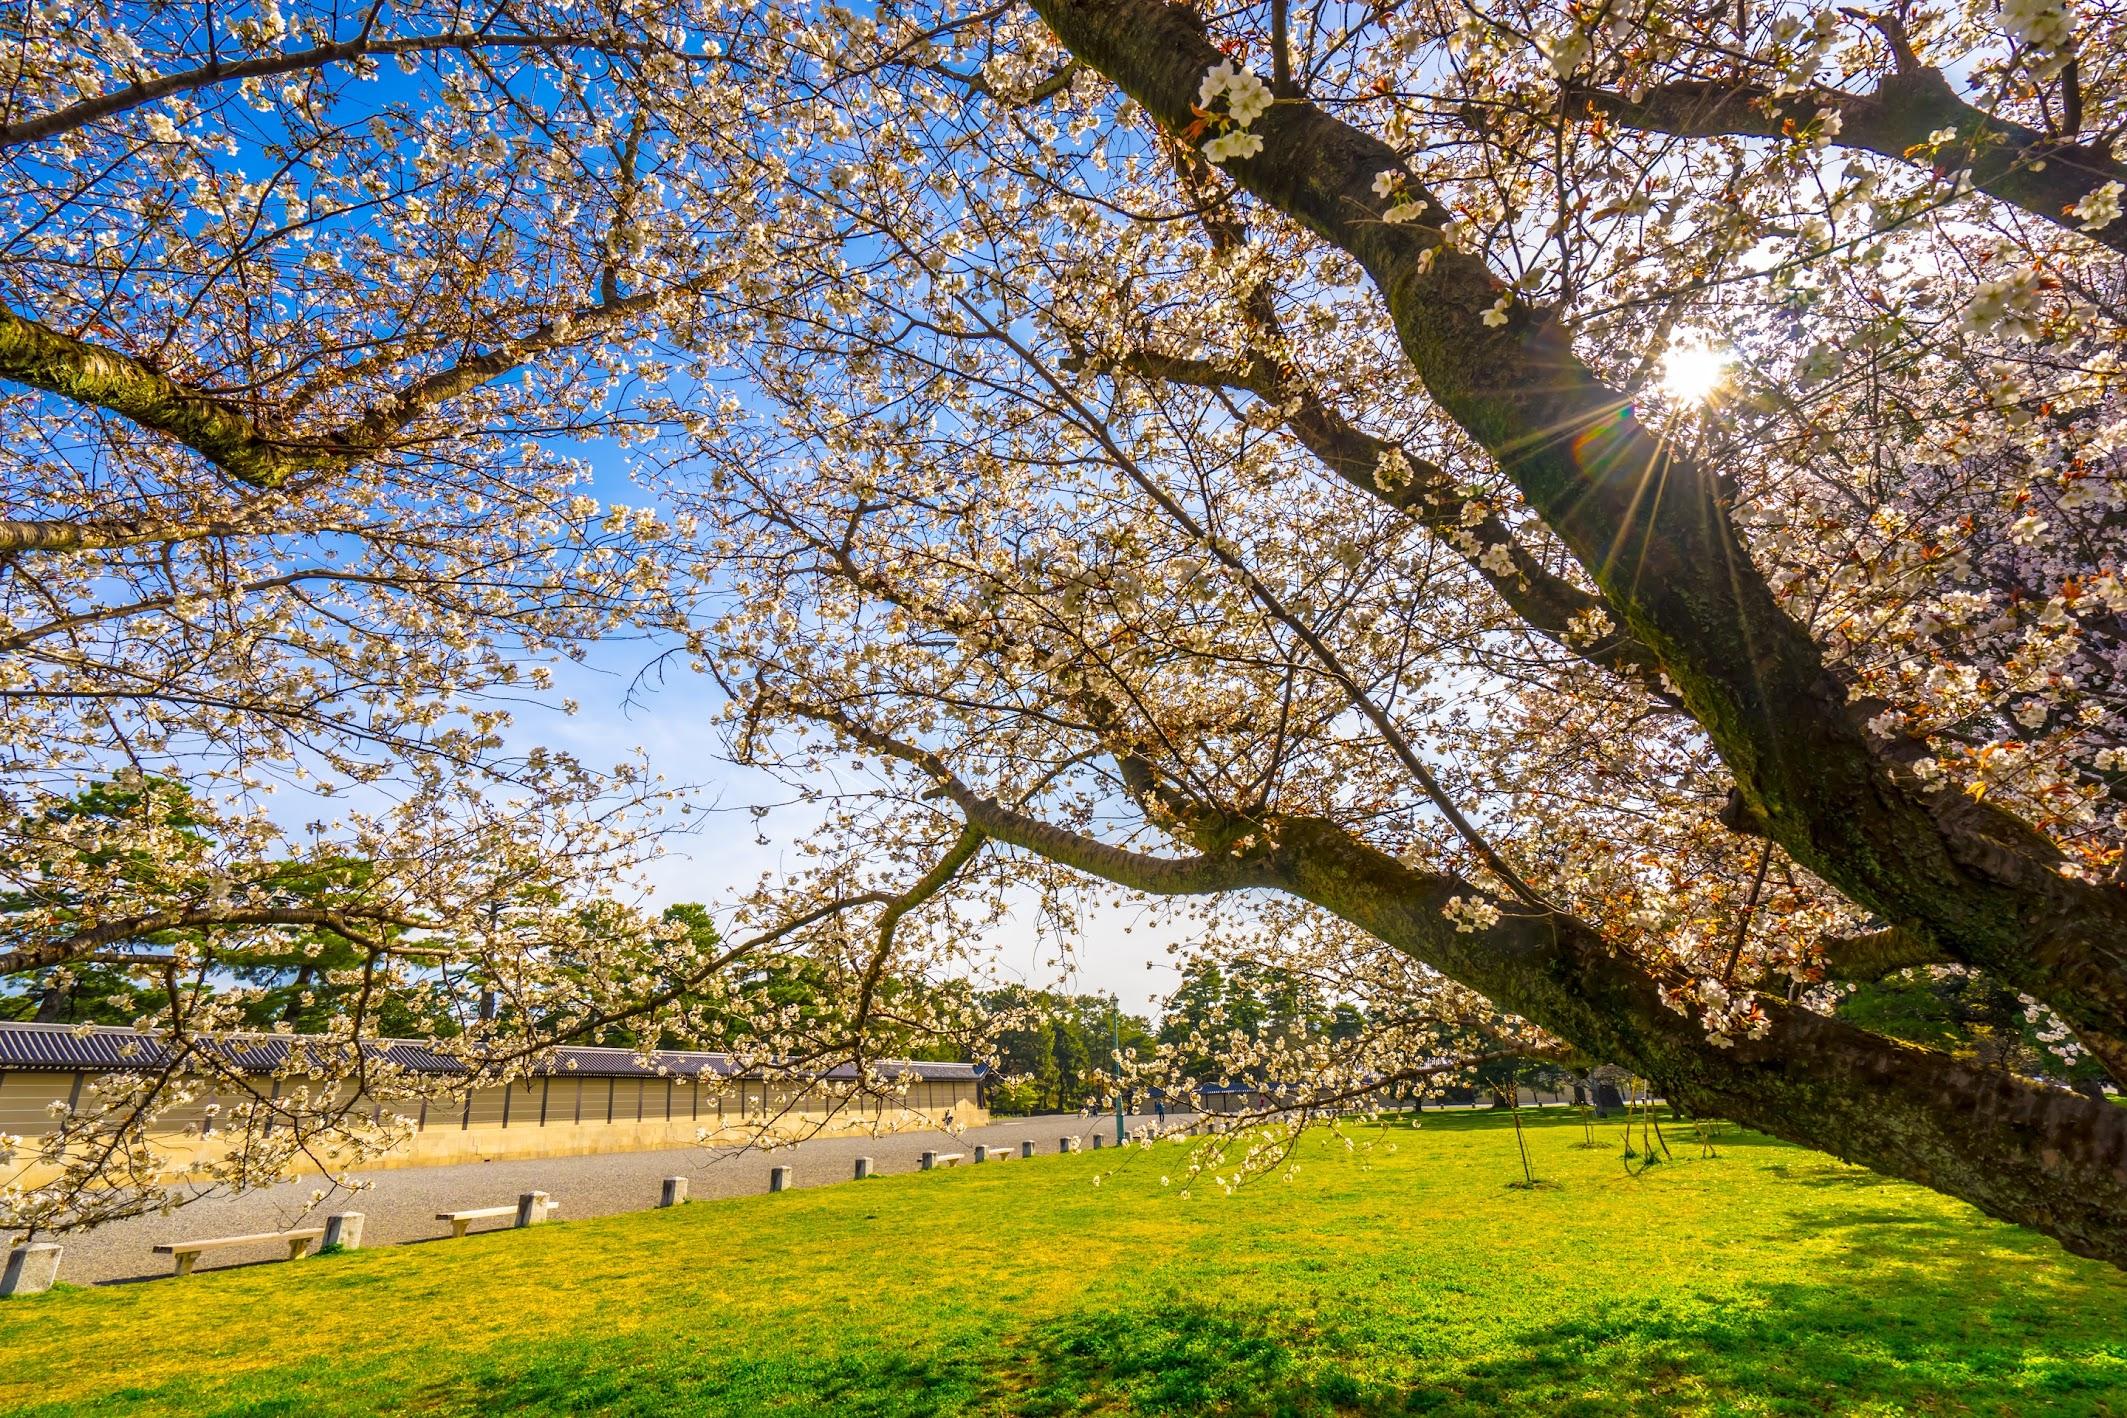 Kyoto gyoen Gakushuin cherry blossoms3